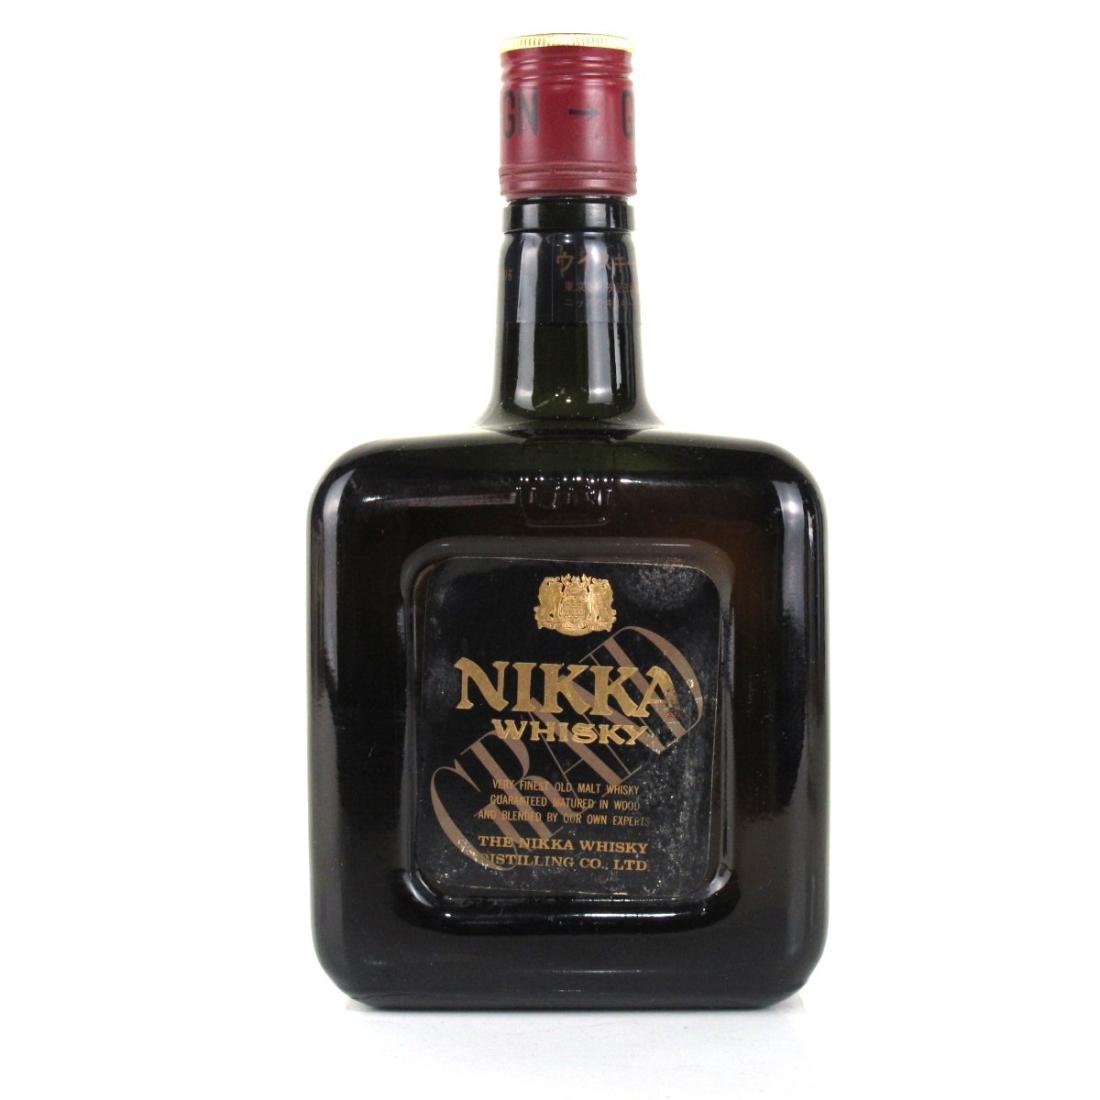 Nikka Grand 1970s